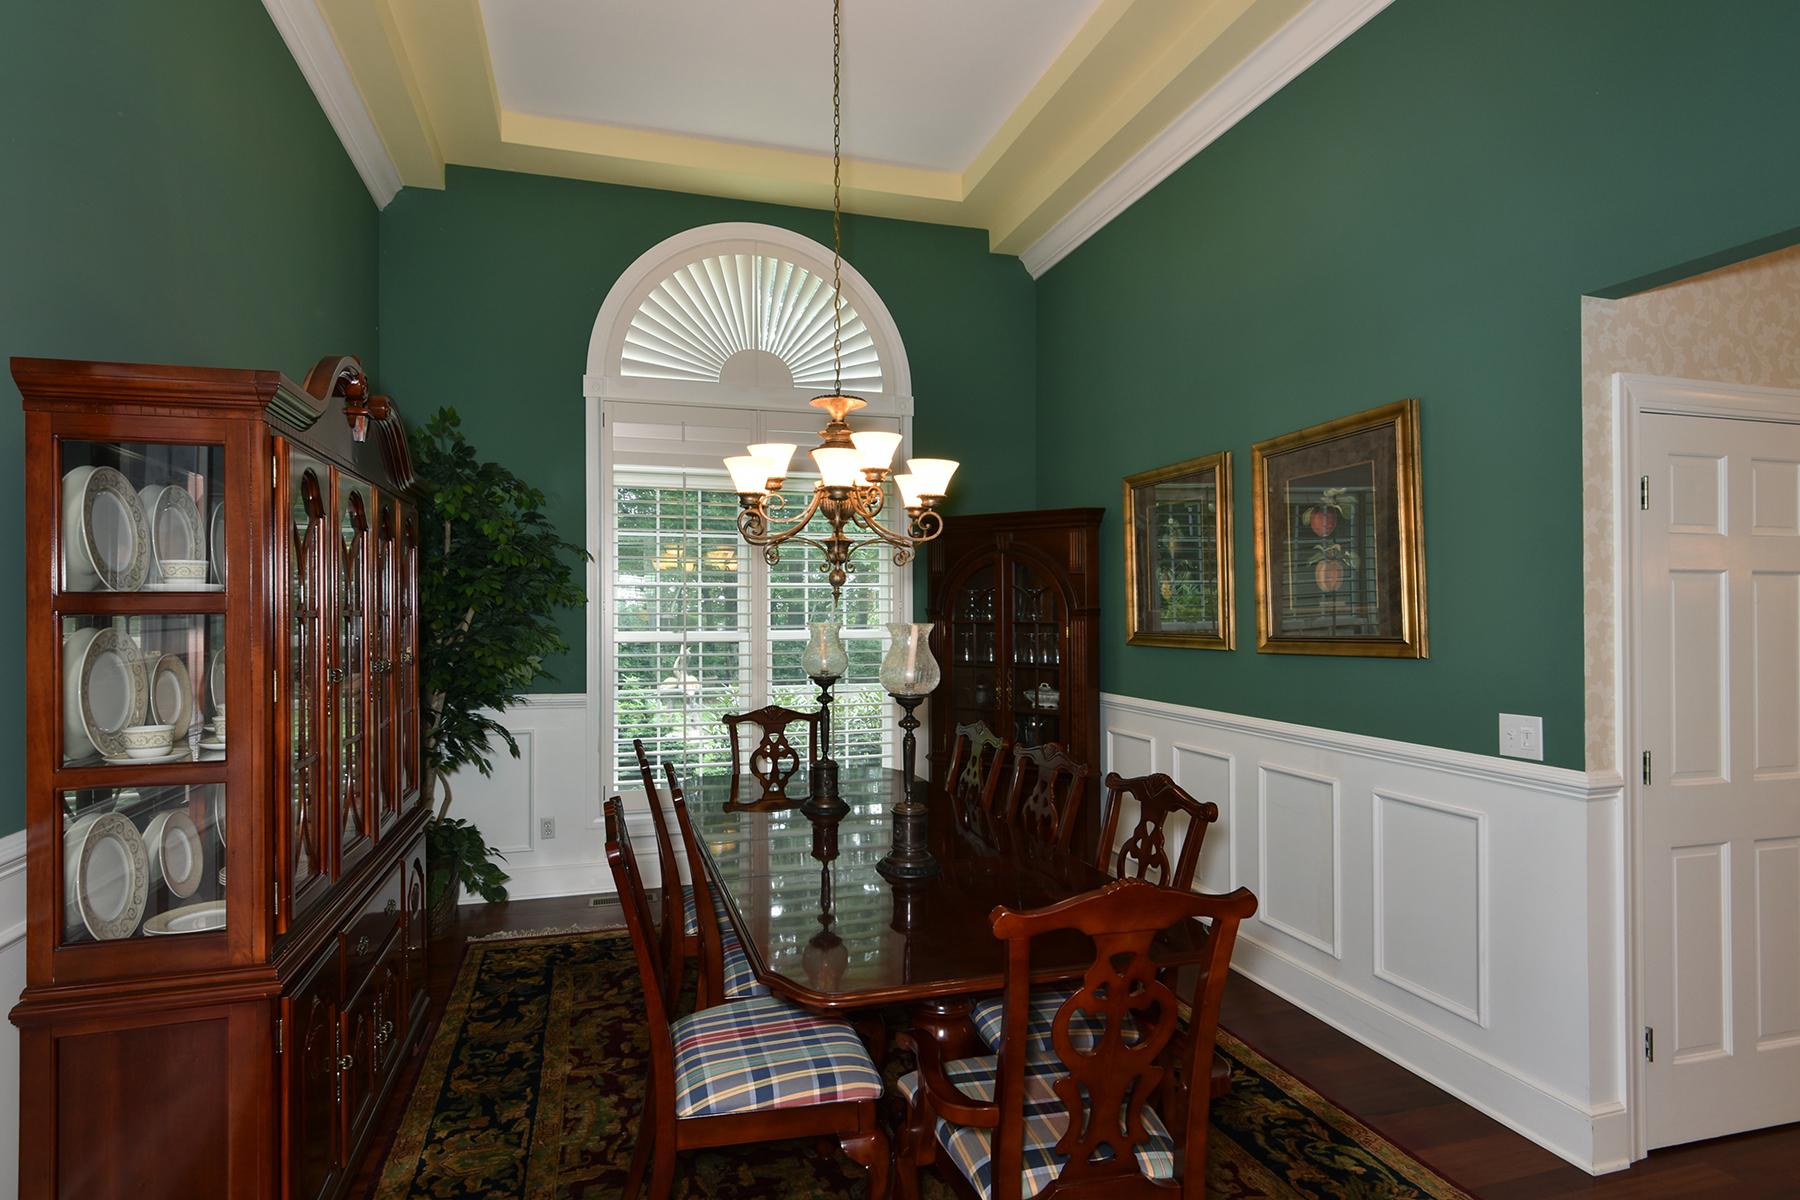 Additional photo for property listing at NEWLAND - MOUNTAIN GLEN 513  Laurel Ln,  Newland, North Carolina 28657 United States